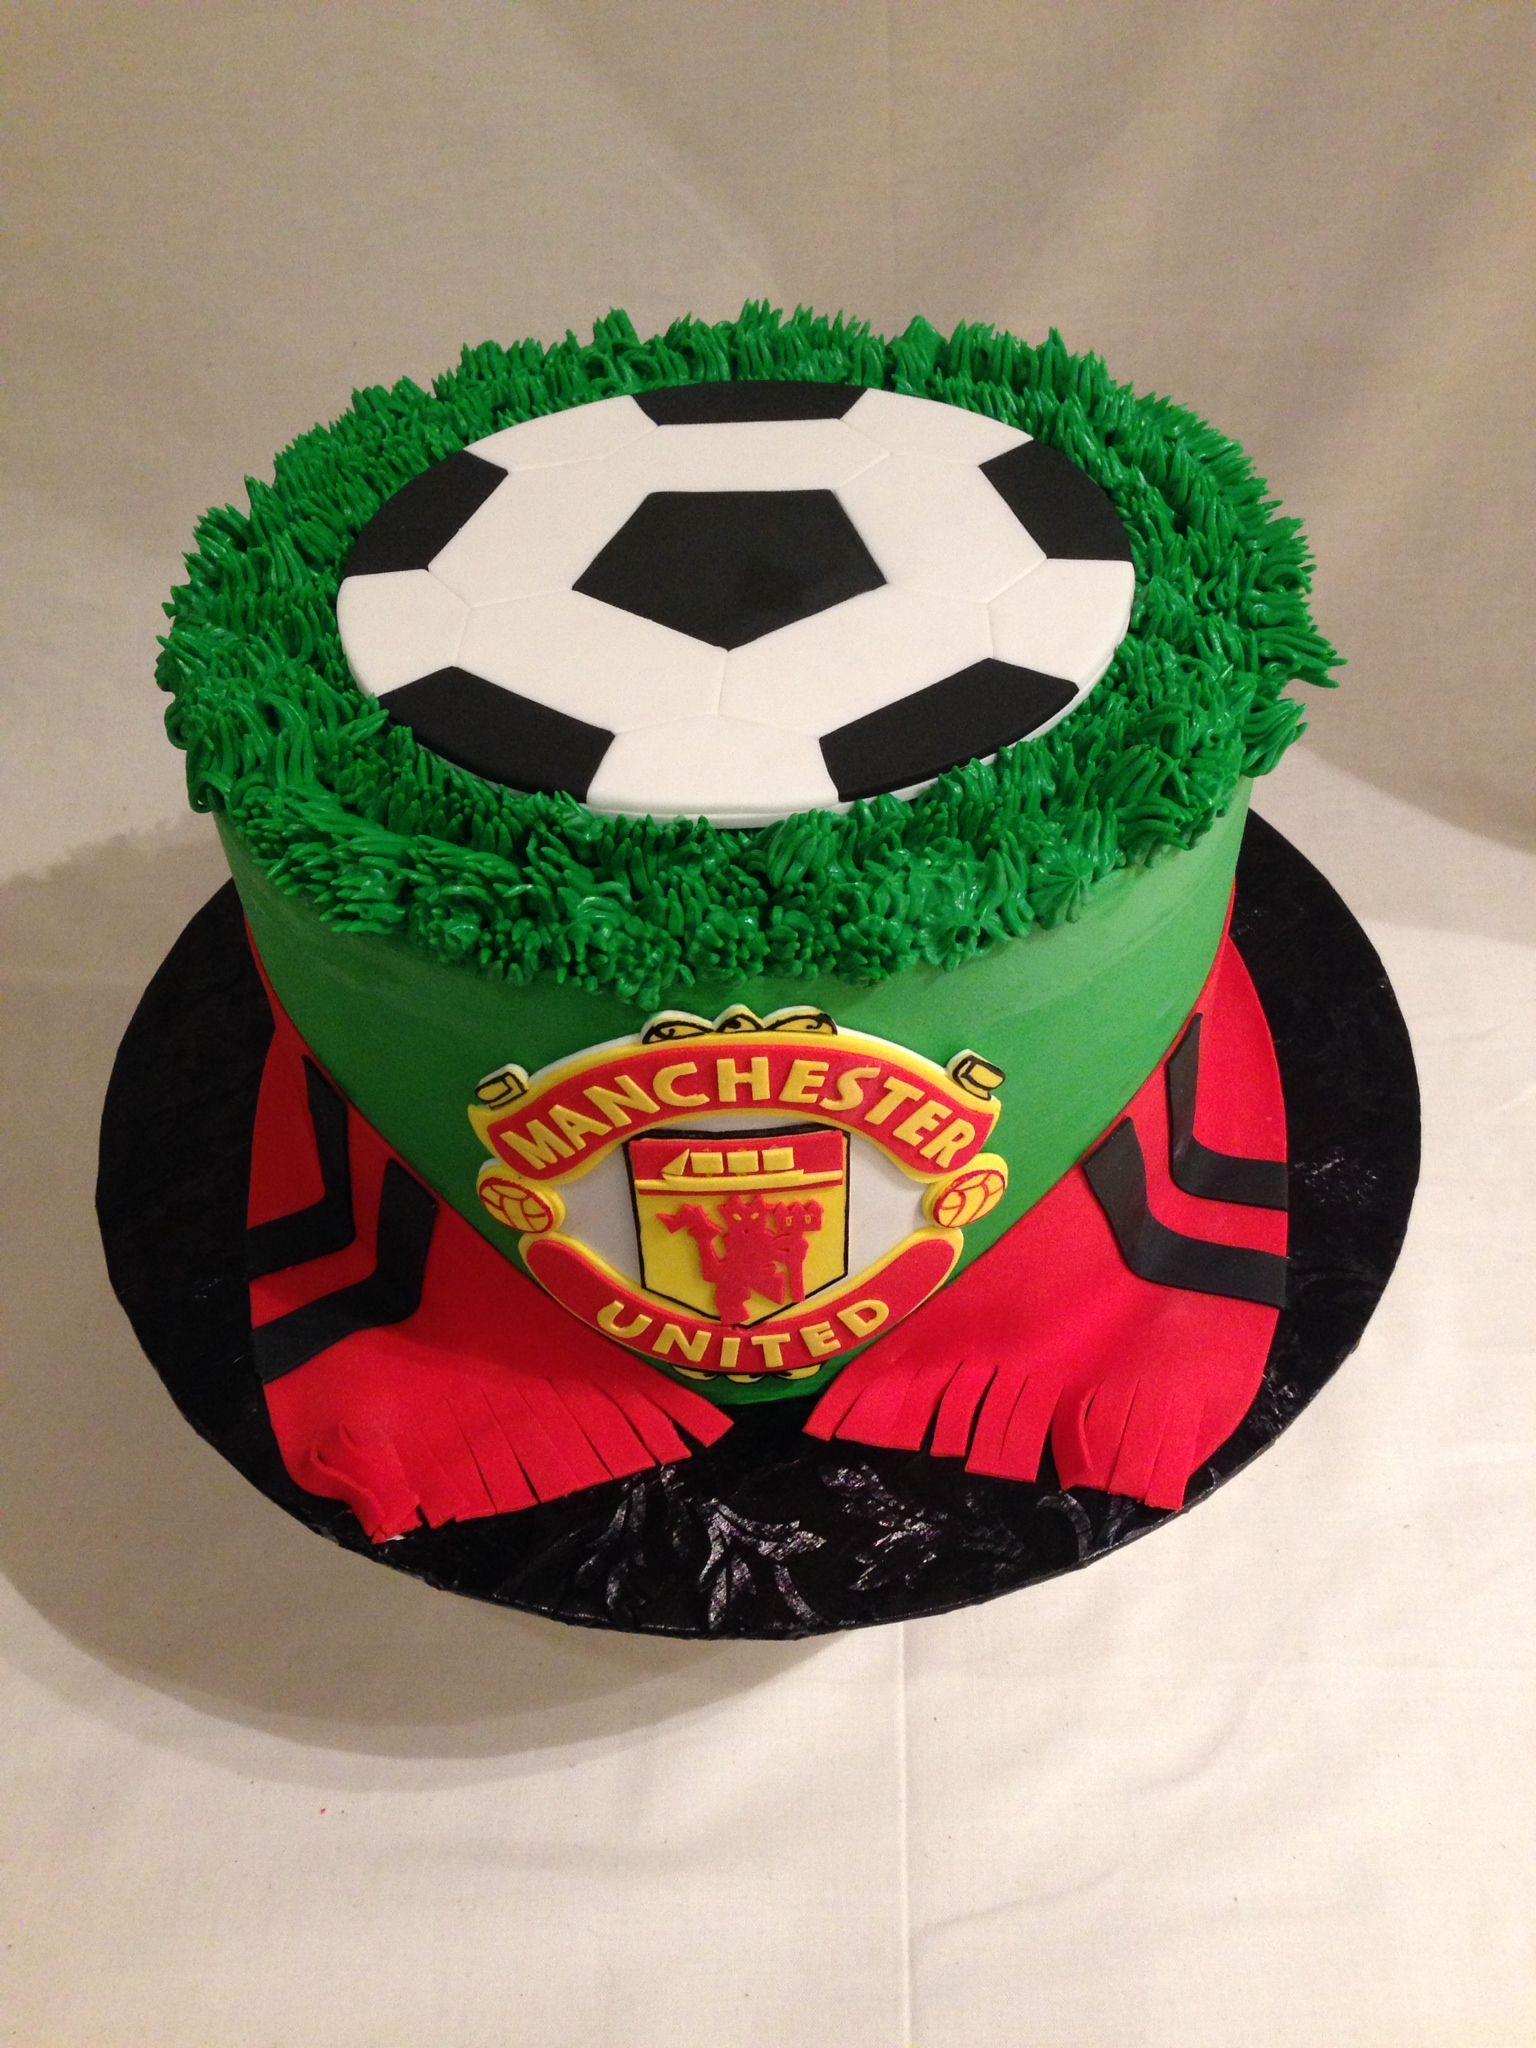 welcome soccer birthday cakes soccer cake manchester united birthday cake soccer birthday cakes soccer cake